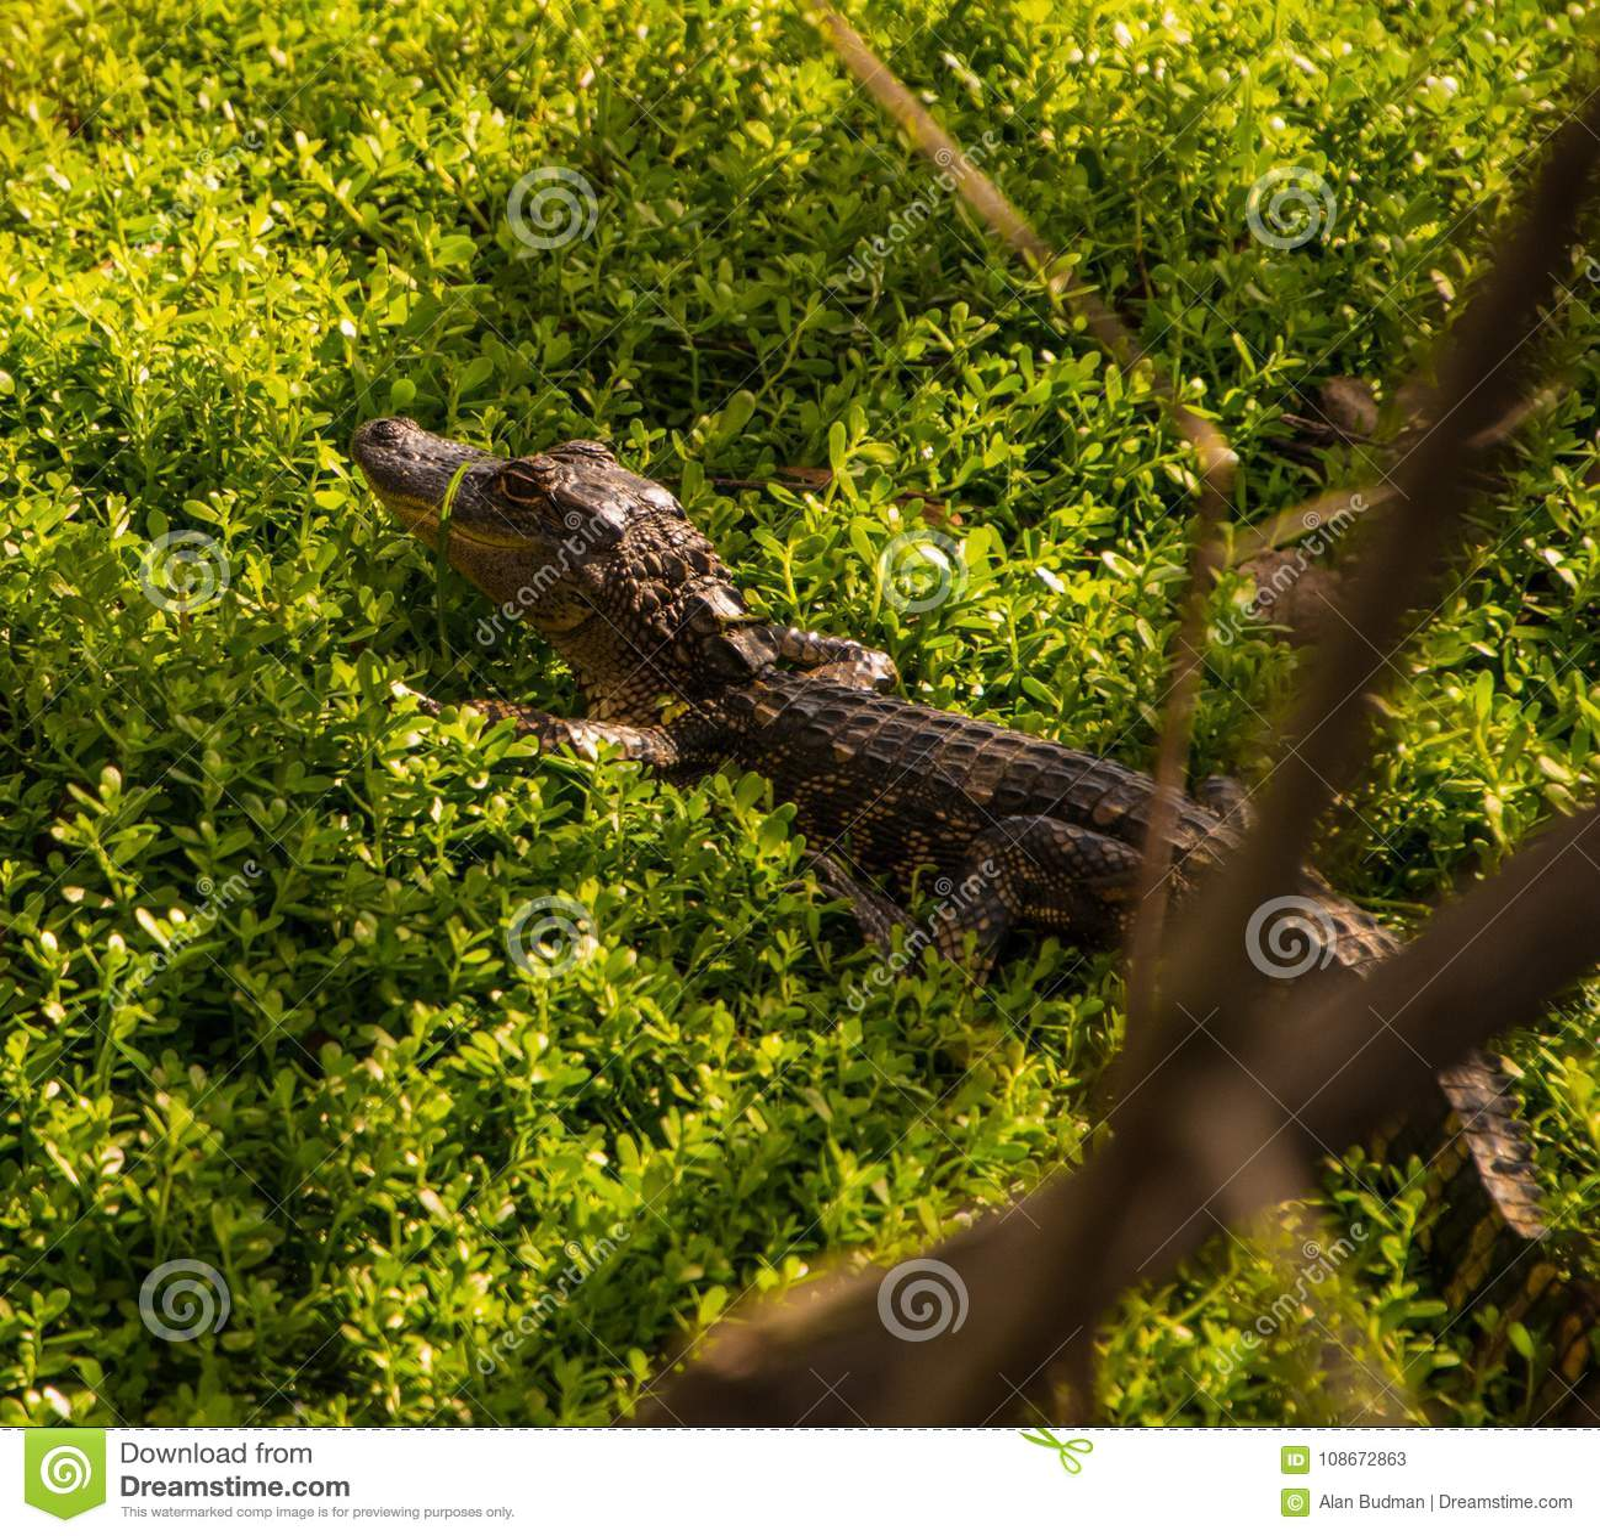 Cute Baby Alligator In Undergrowth Stock Image Image Of Crocodile